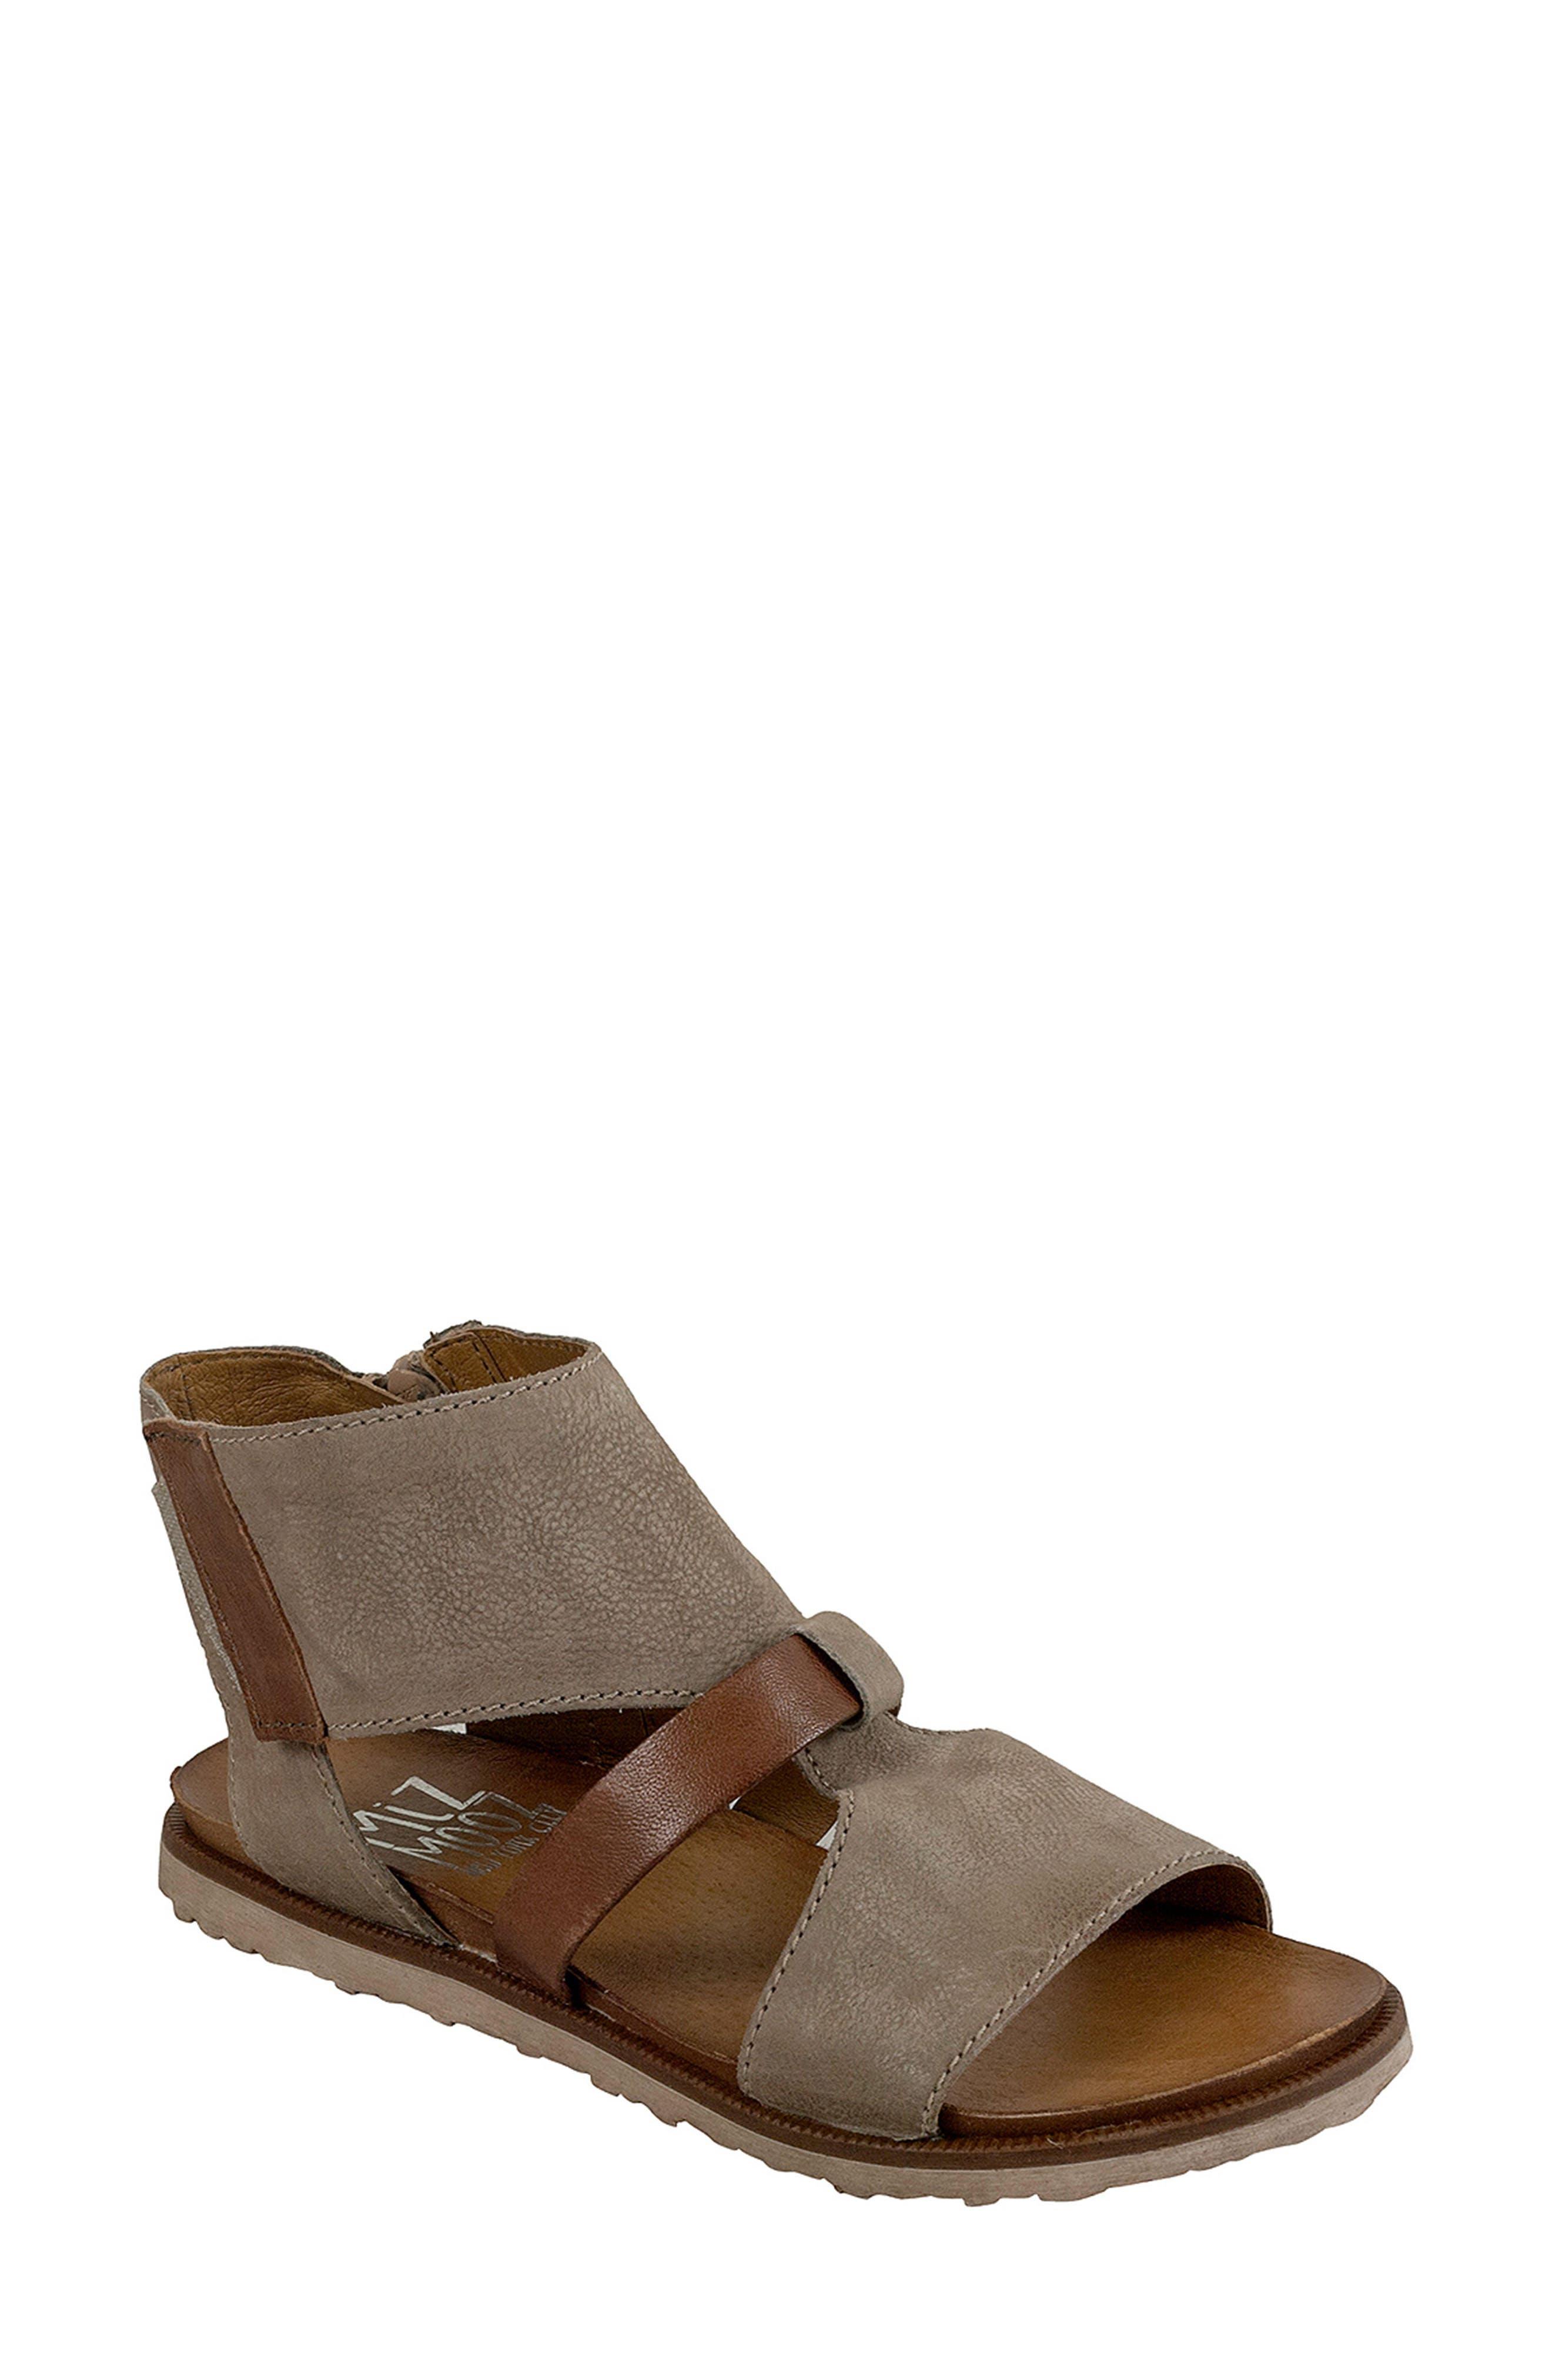 Miz Mooz Shoes Nordstrom Austin Sandal Mitzi Silver